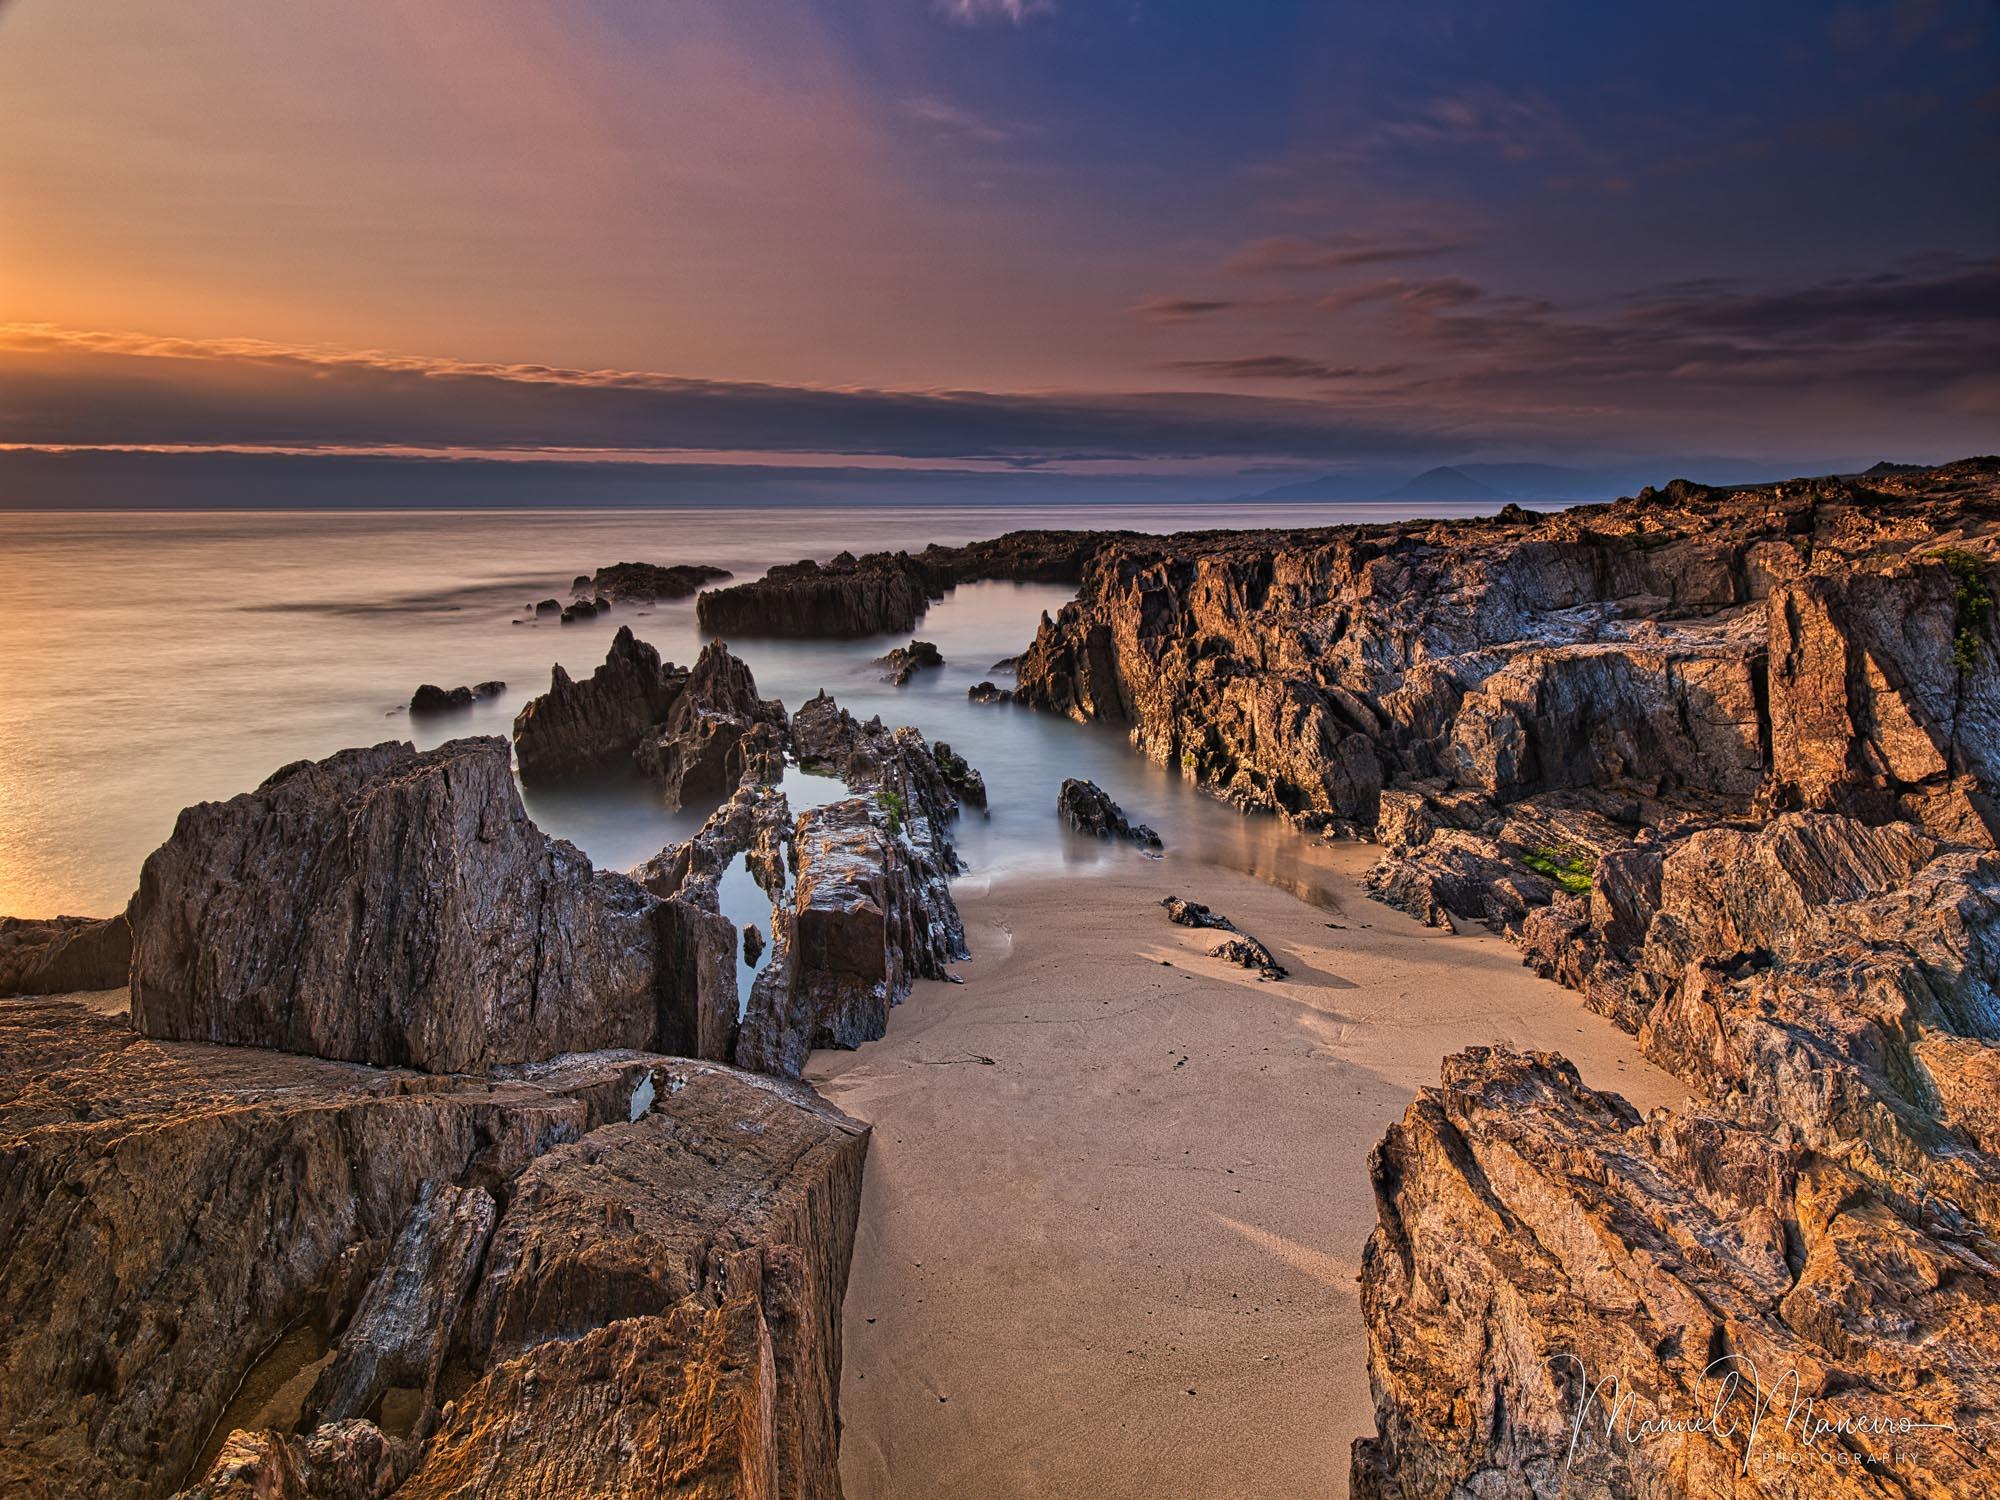 0616 Beach Sunset Seascape Photography ©Manuel Maneiro